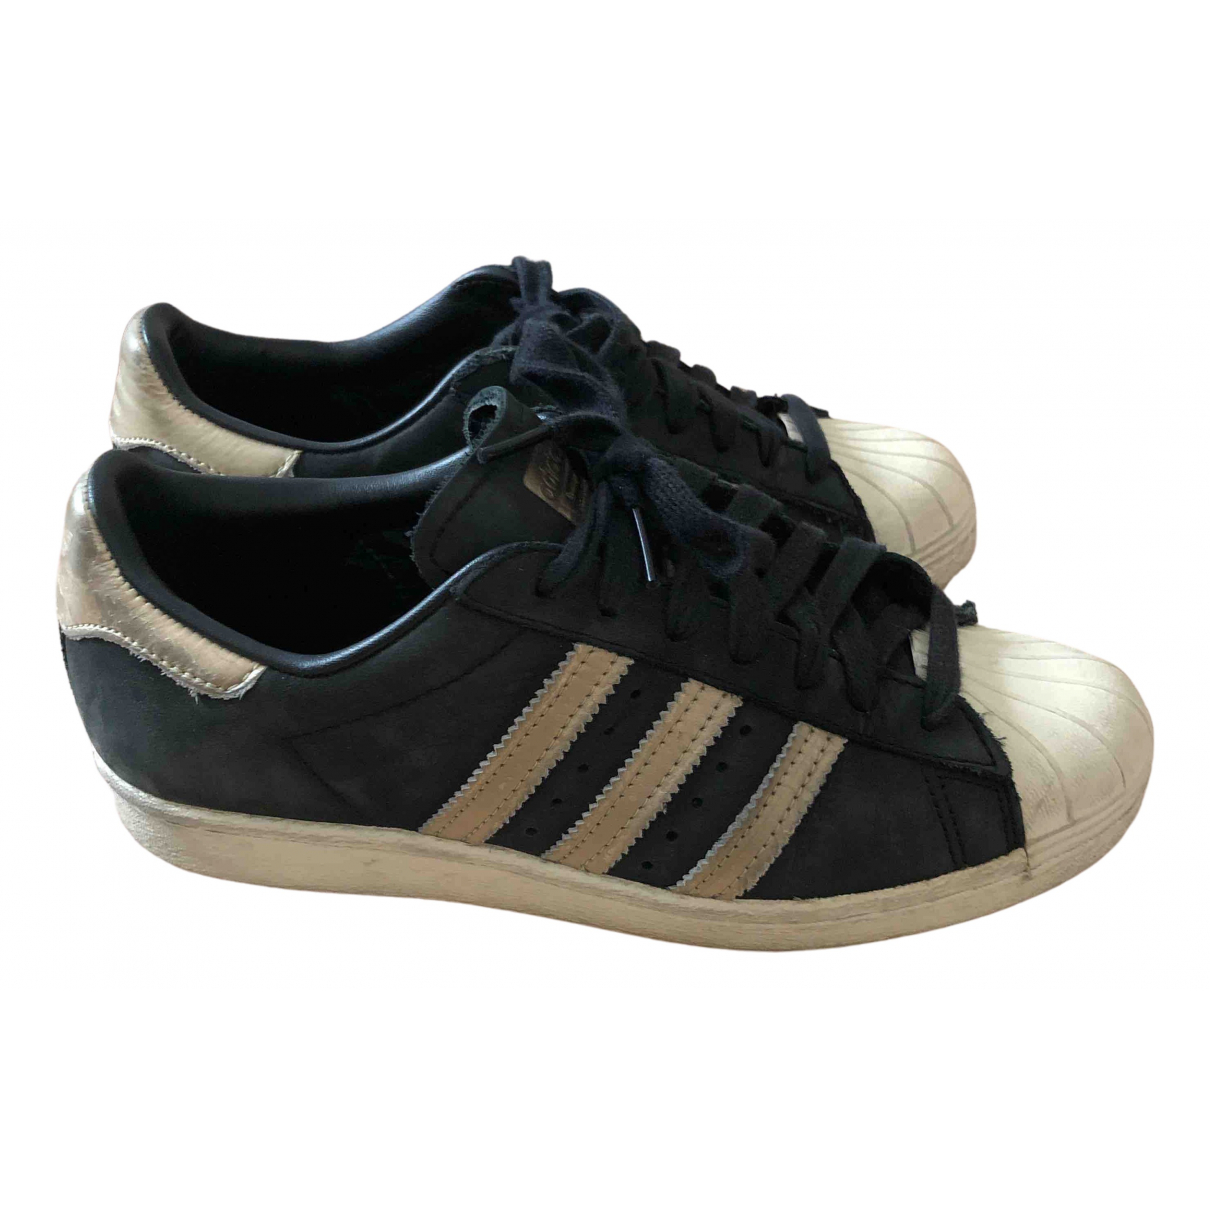 Adidas Superstar Sneakers in  Schwarz Veloursleder